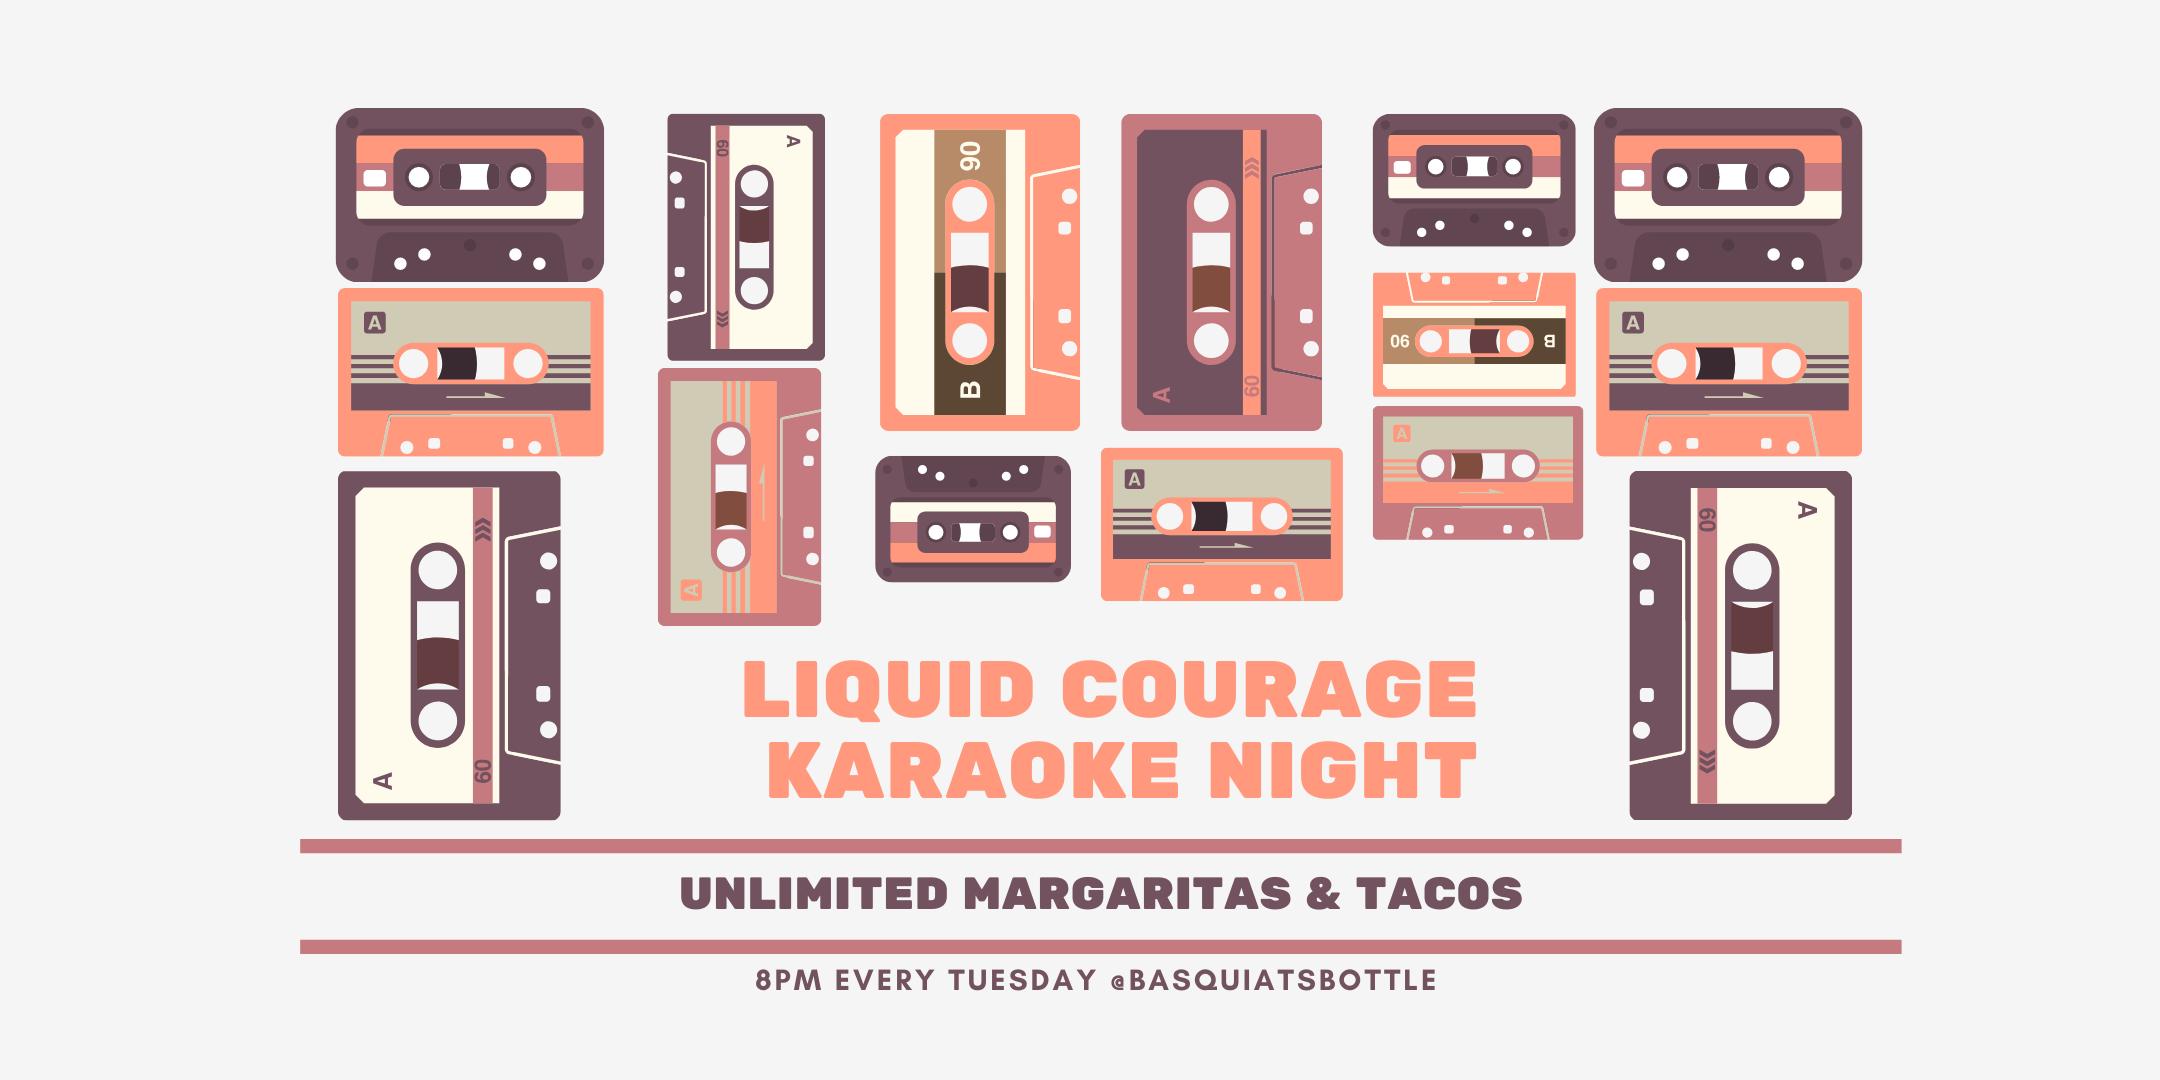 Liquid Courage Karaoke Night